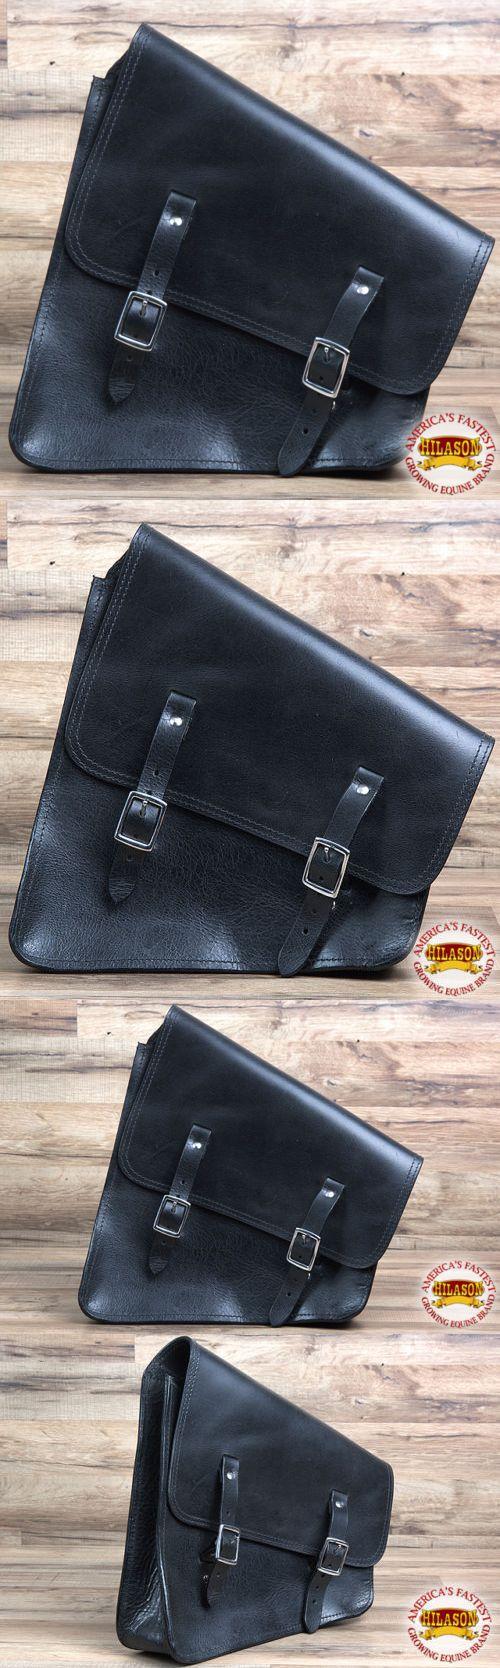 Saddle Bags 47300: Hs901-F Hilason Western Leather Cowboy Trail Ride Horse Saddle Bag Black -> BUY IT NOW ONLY: $124.99 on eBay!